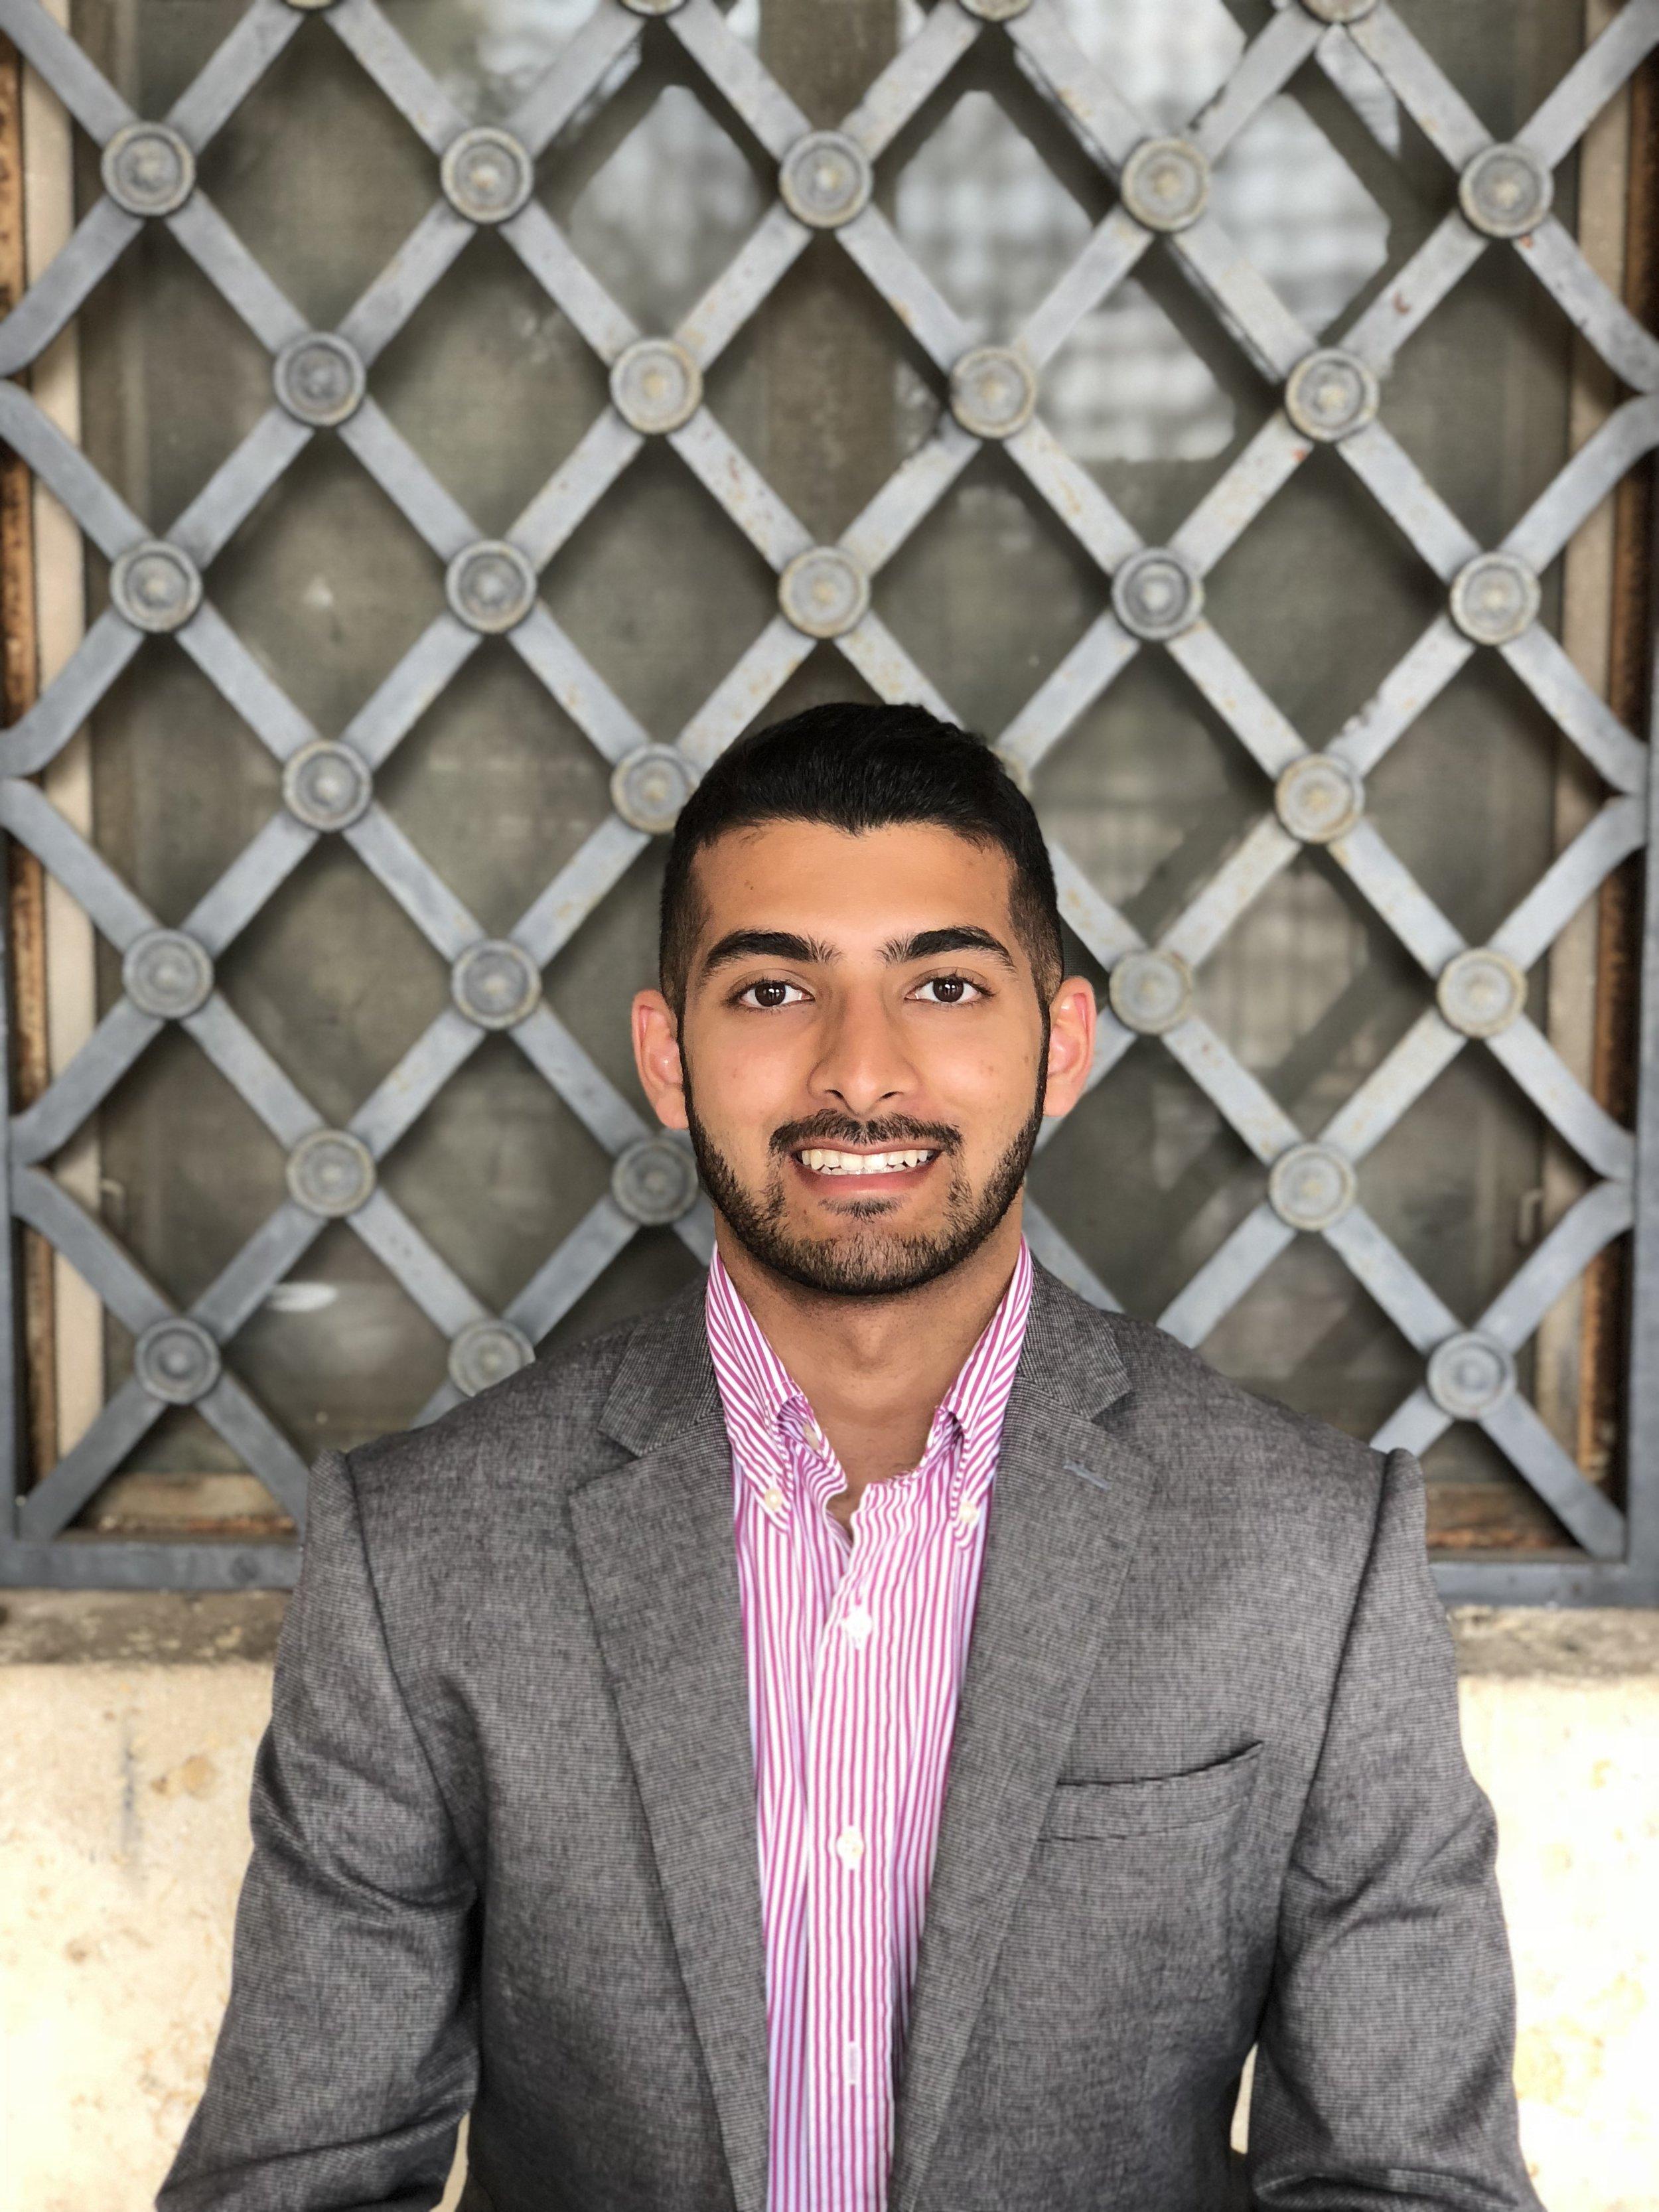 Taiyeb Rangwalla, Associate Editor